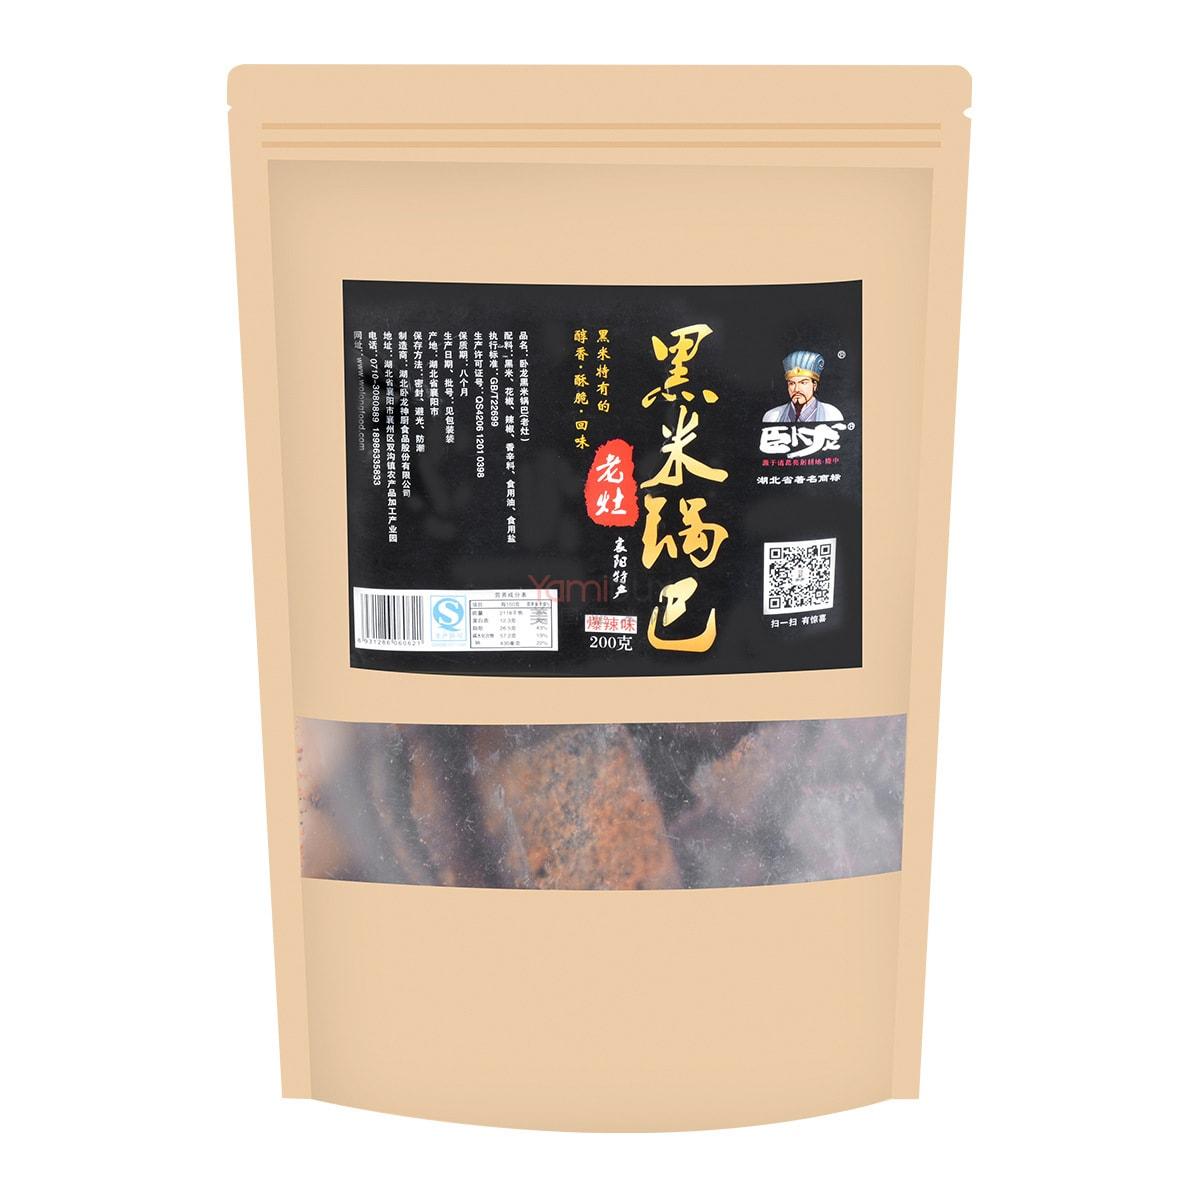 WOLONG Black Rice Crisps Hot Spicy 200g